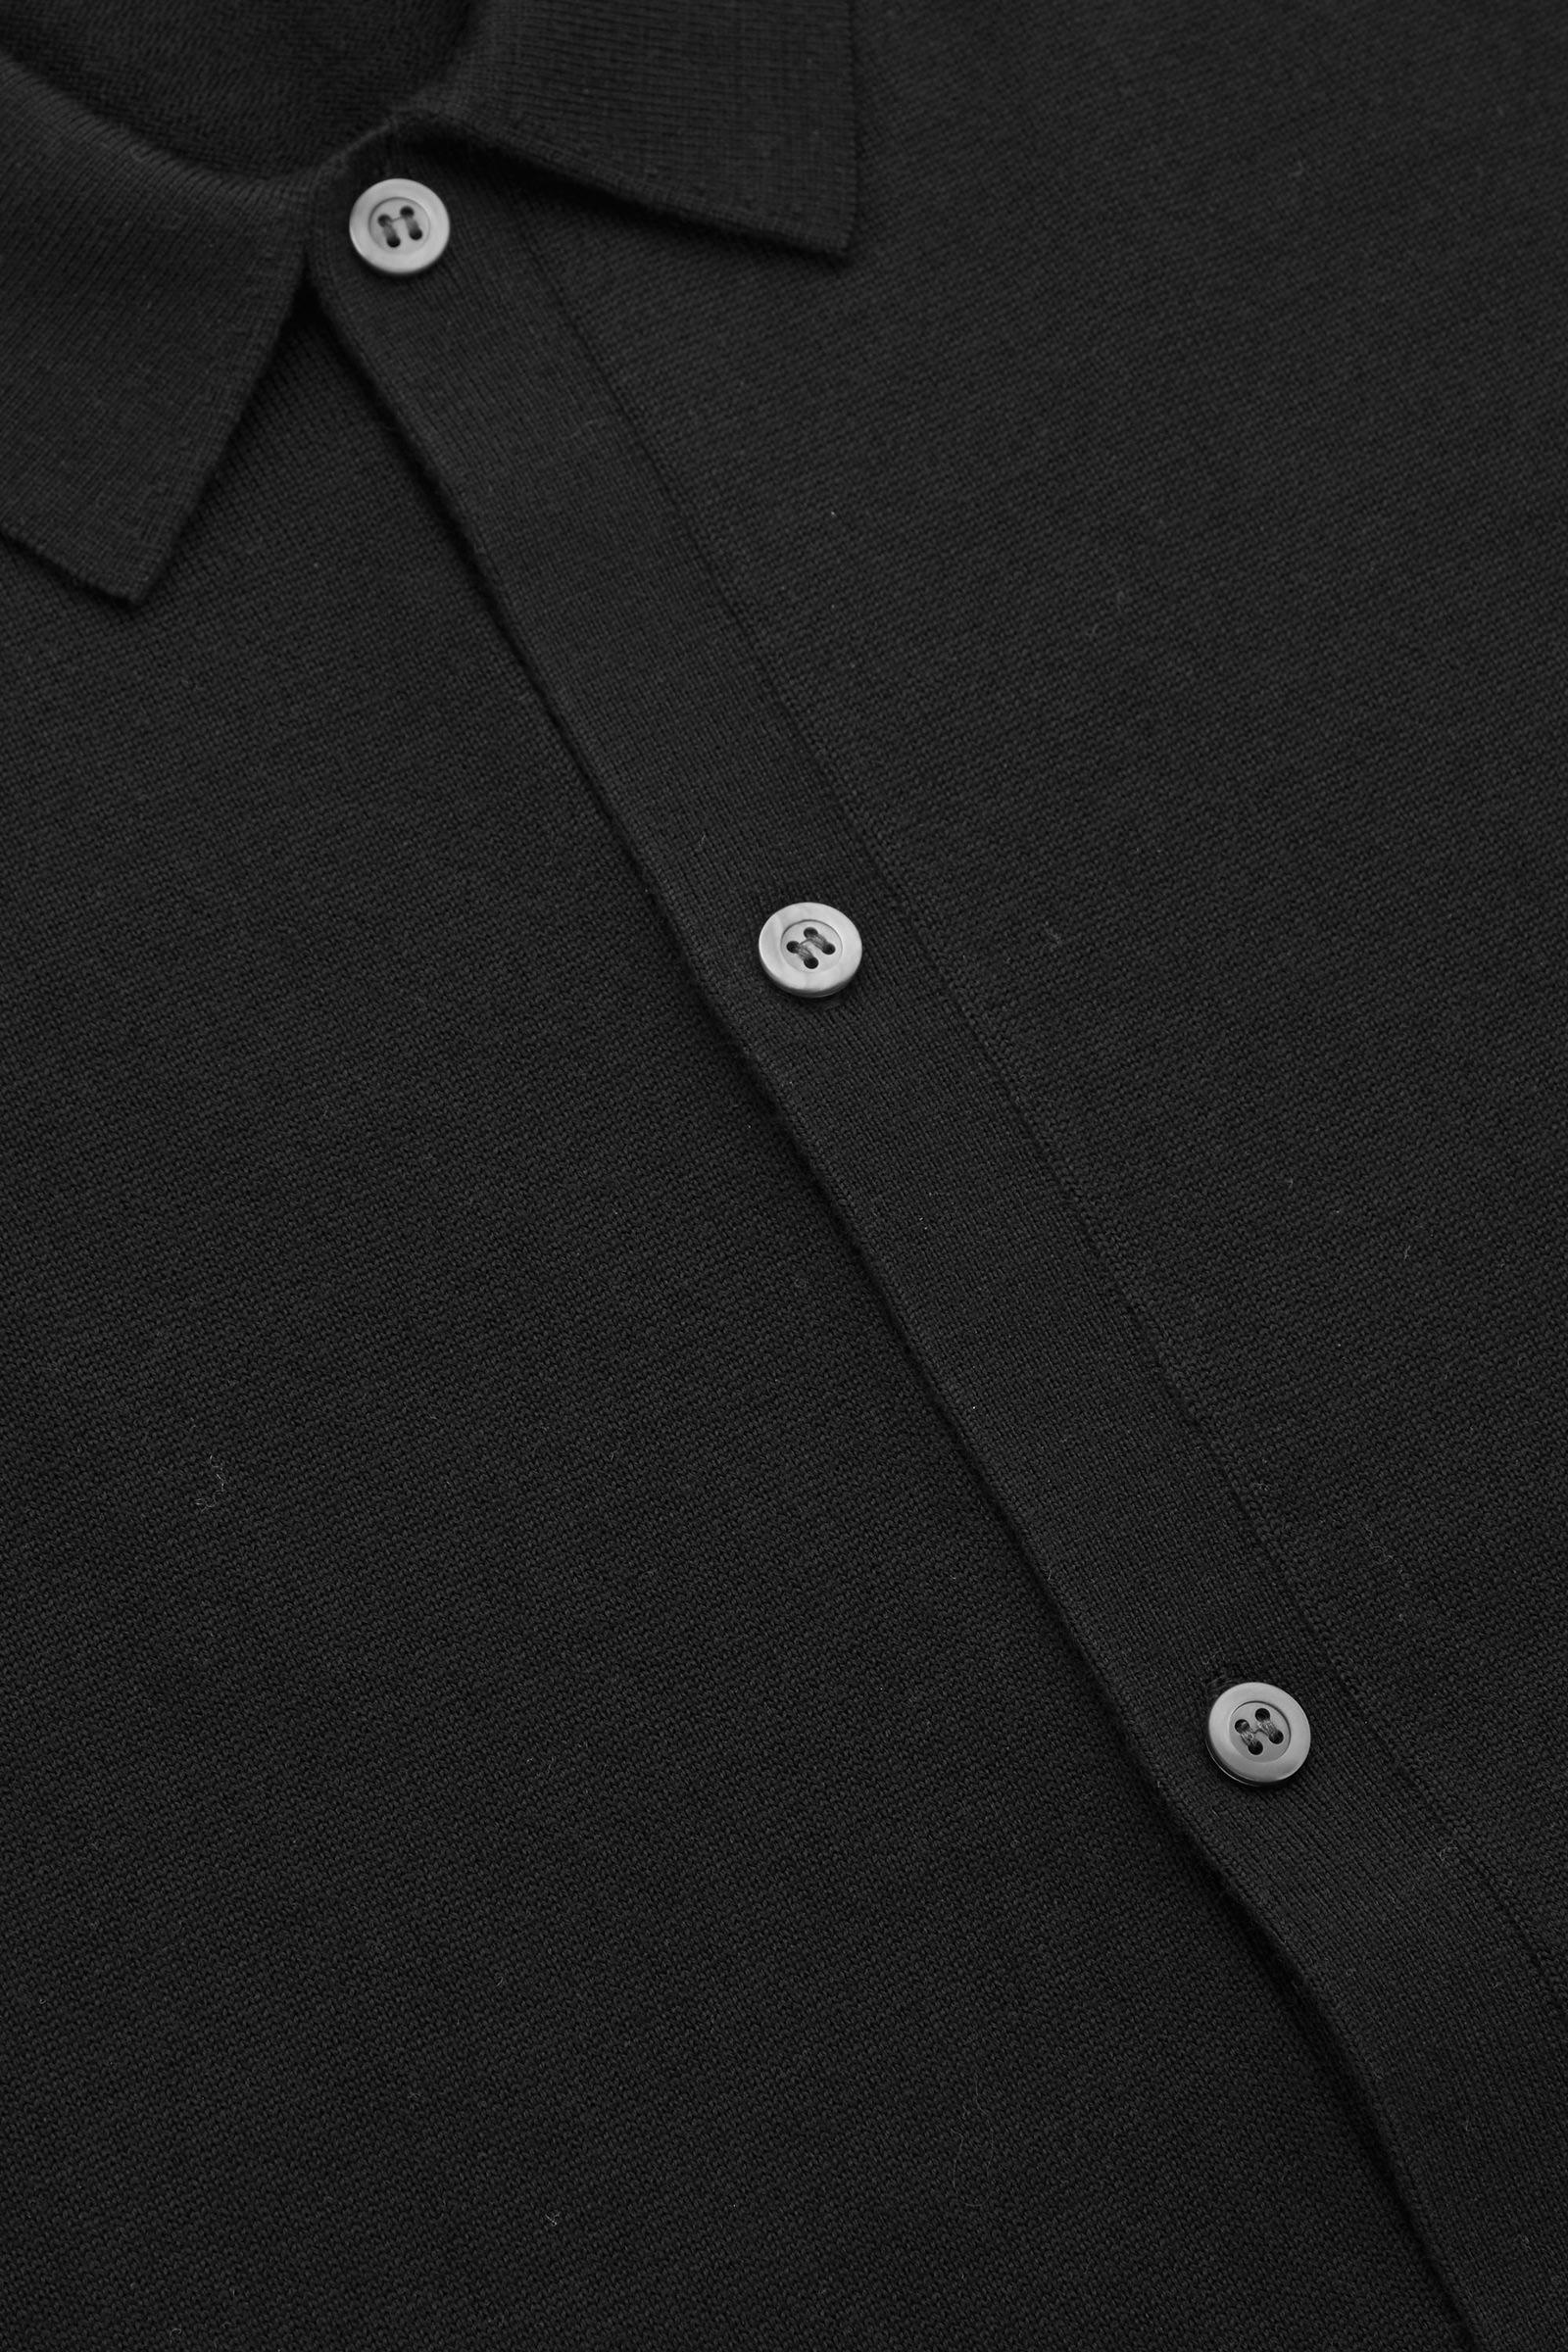 COS 니티드 메리노 울 셔츠의 블랙컬러 Detail입니다.